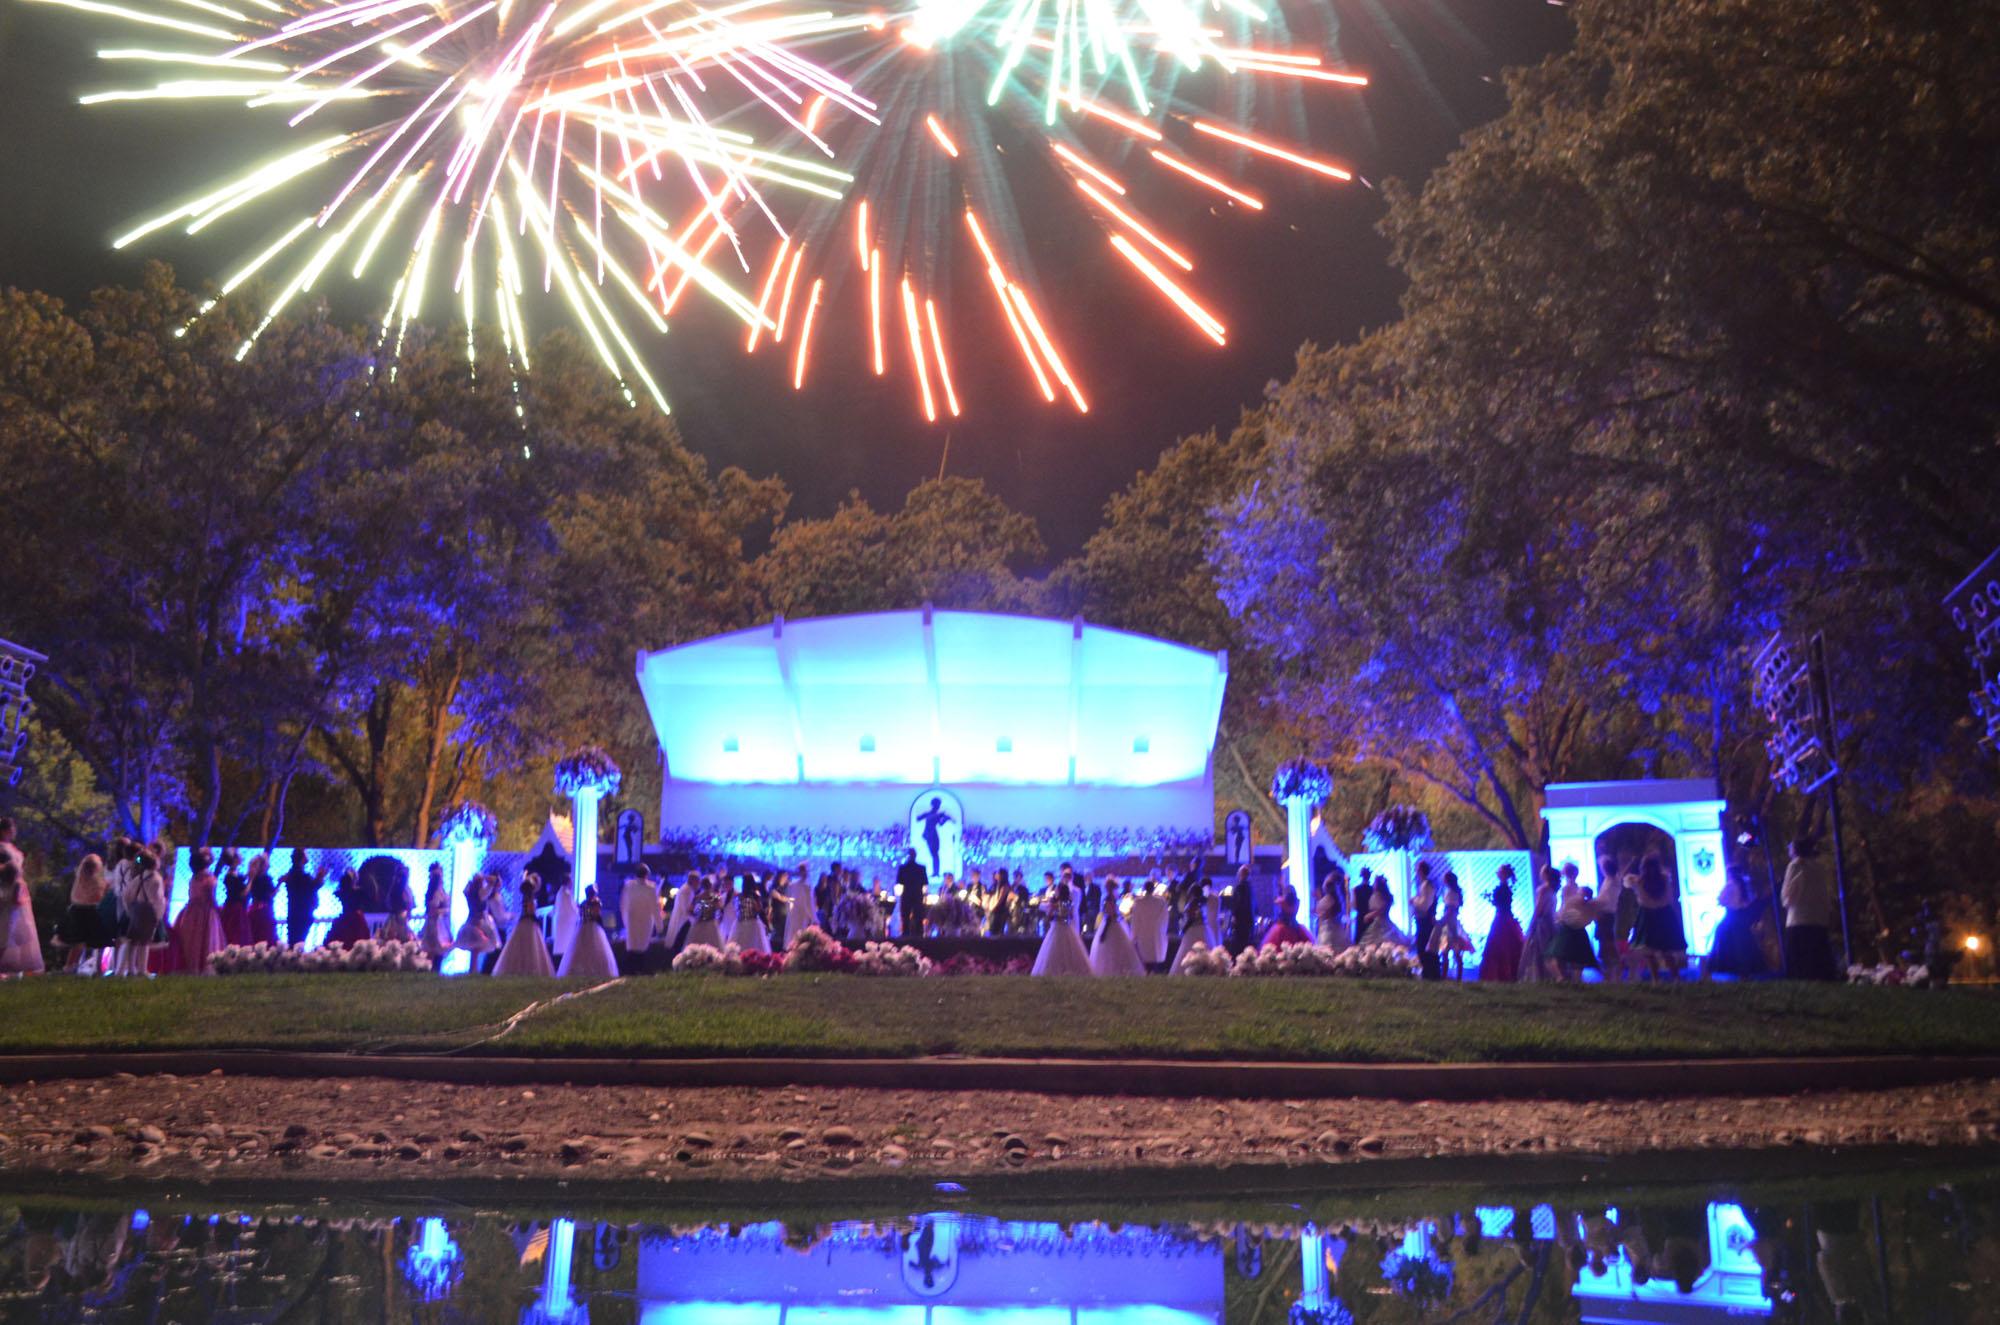 Strauss Festival – July 25-28, 2019